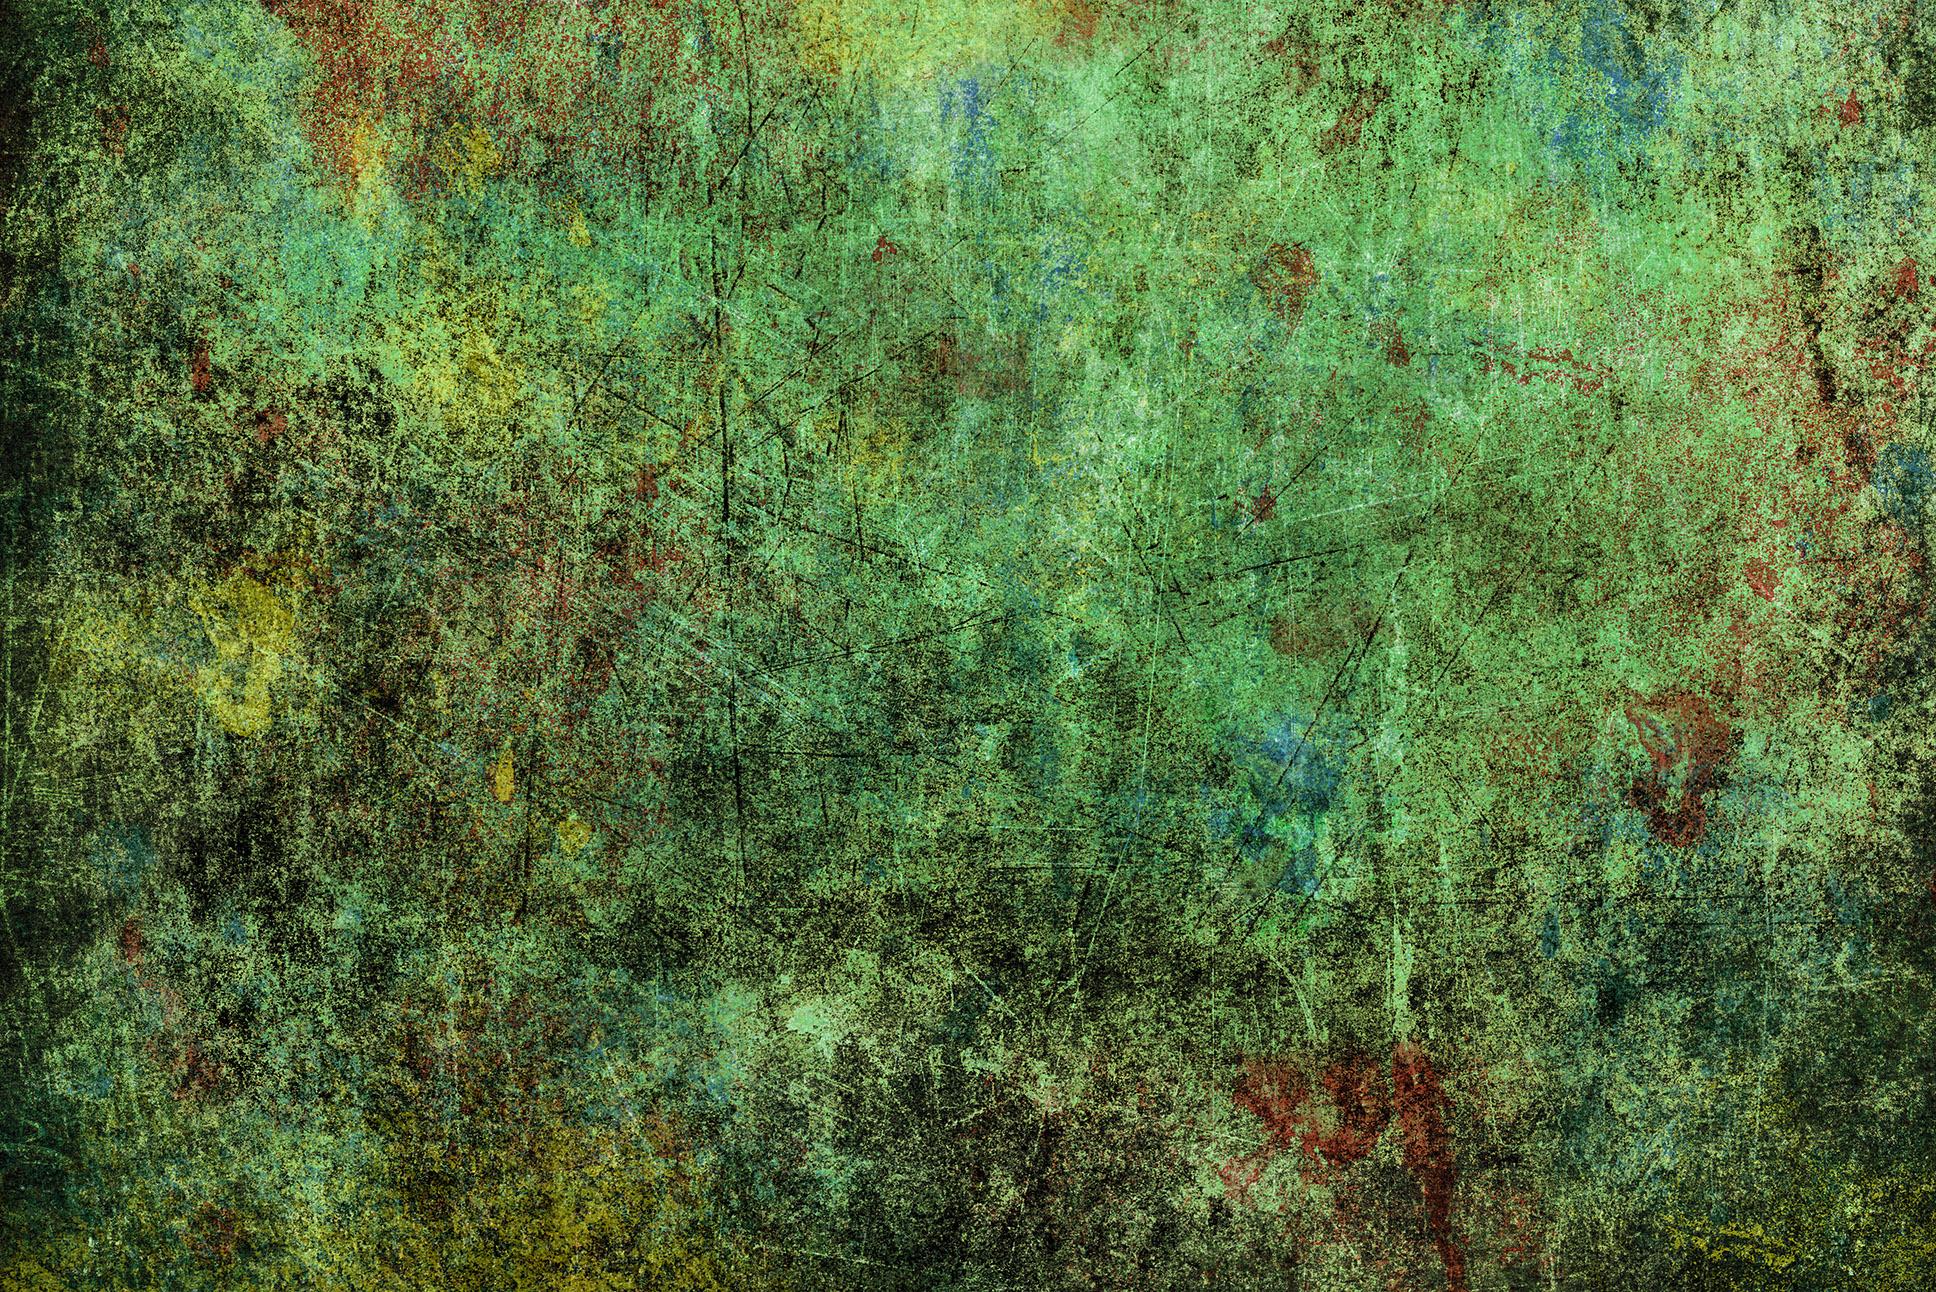 Rough Texture Background: Freebie Fridays! Design Freebie #7: Free High Resolution